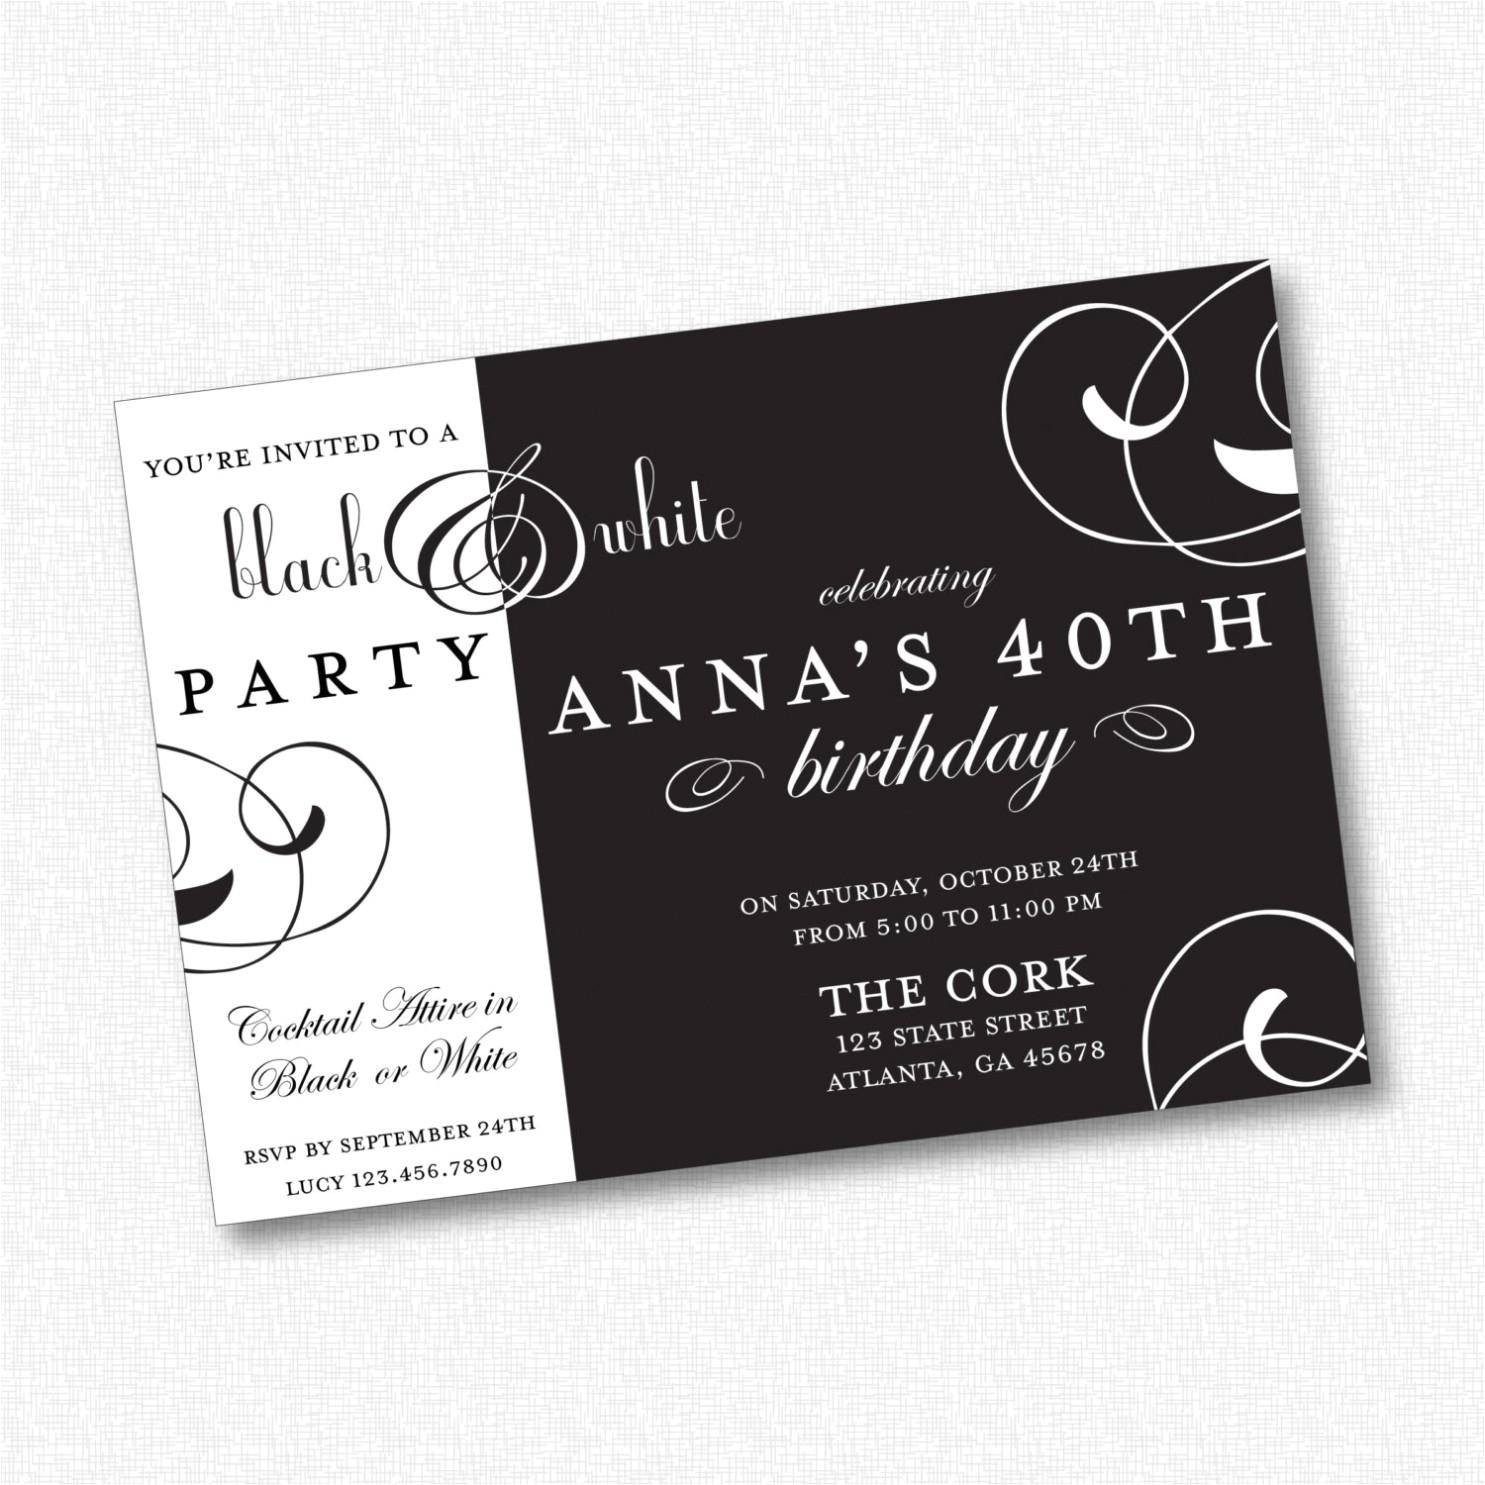 Black White Party Invitation Wording White Party Invitation Wording Black and White Party